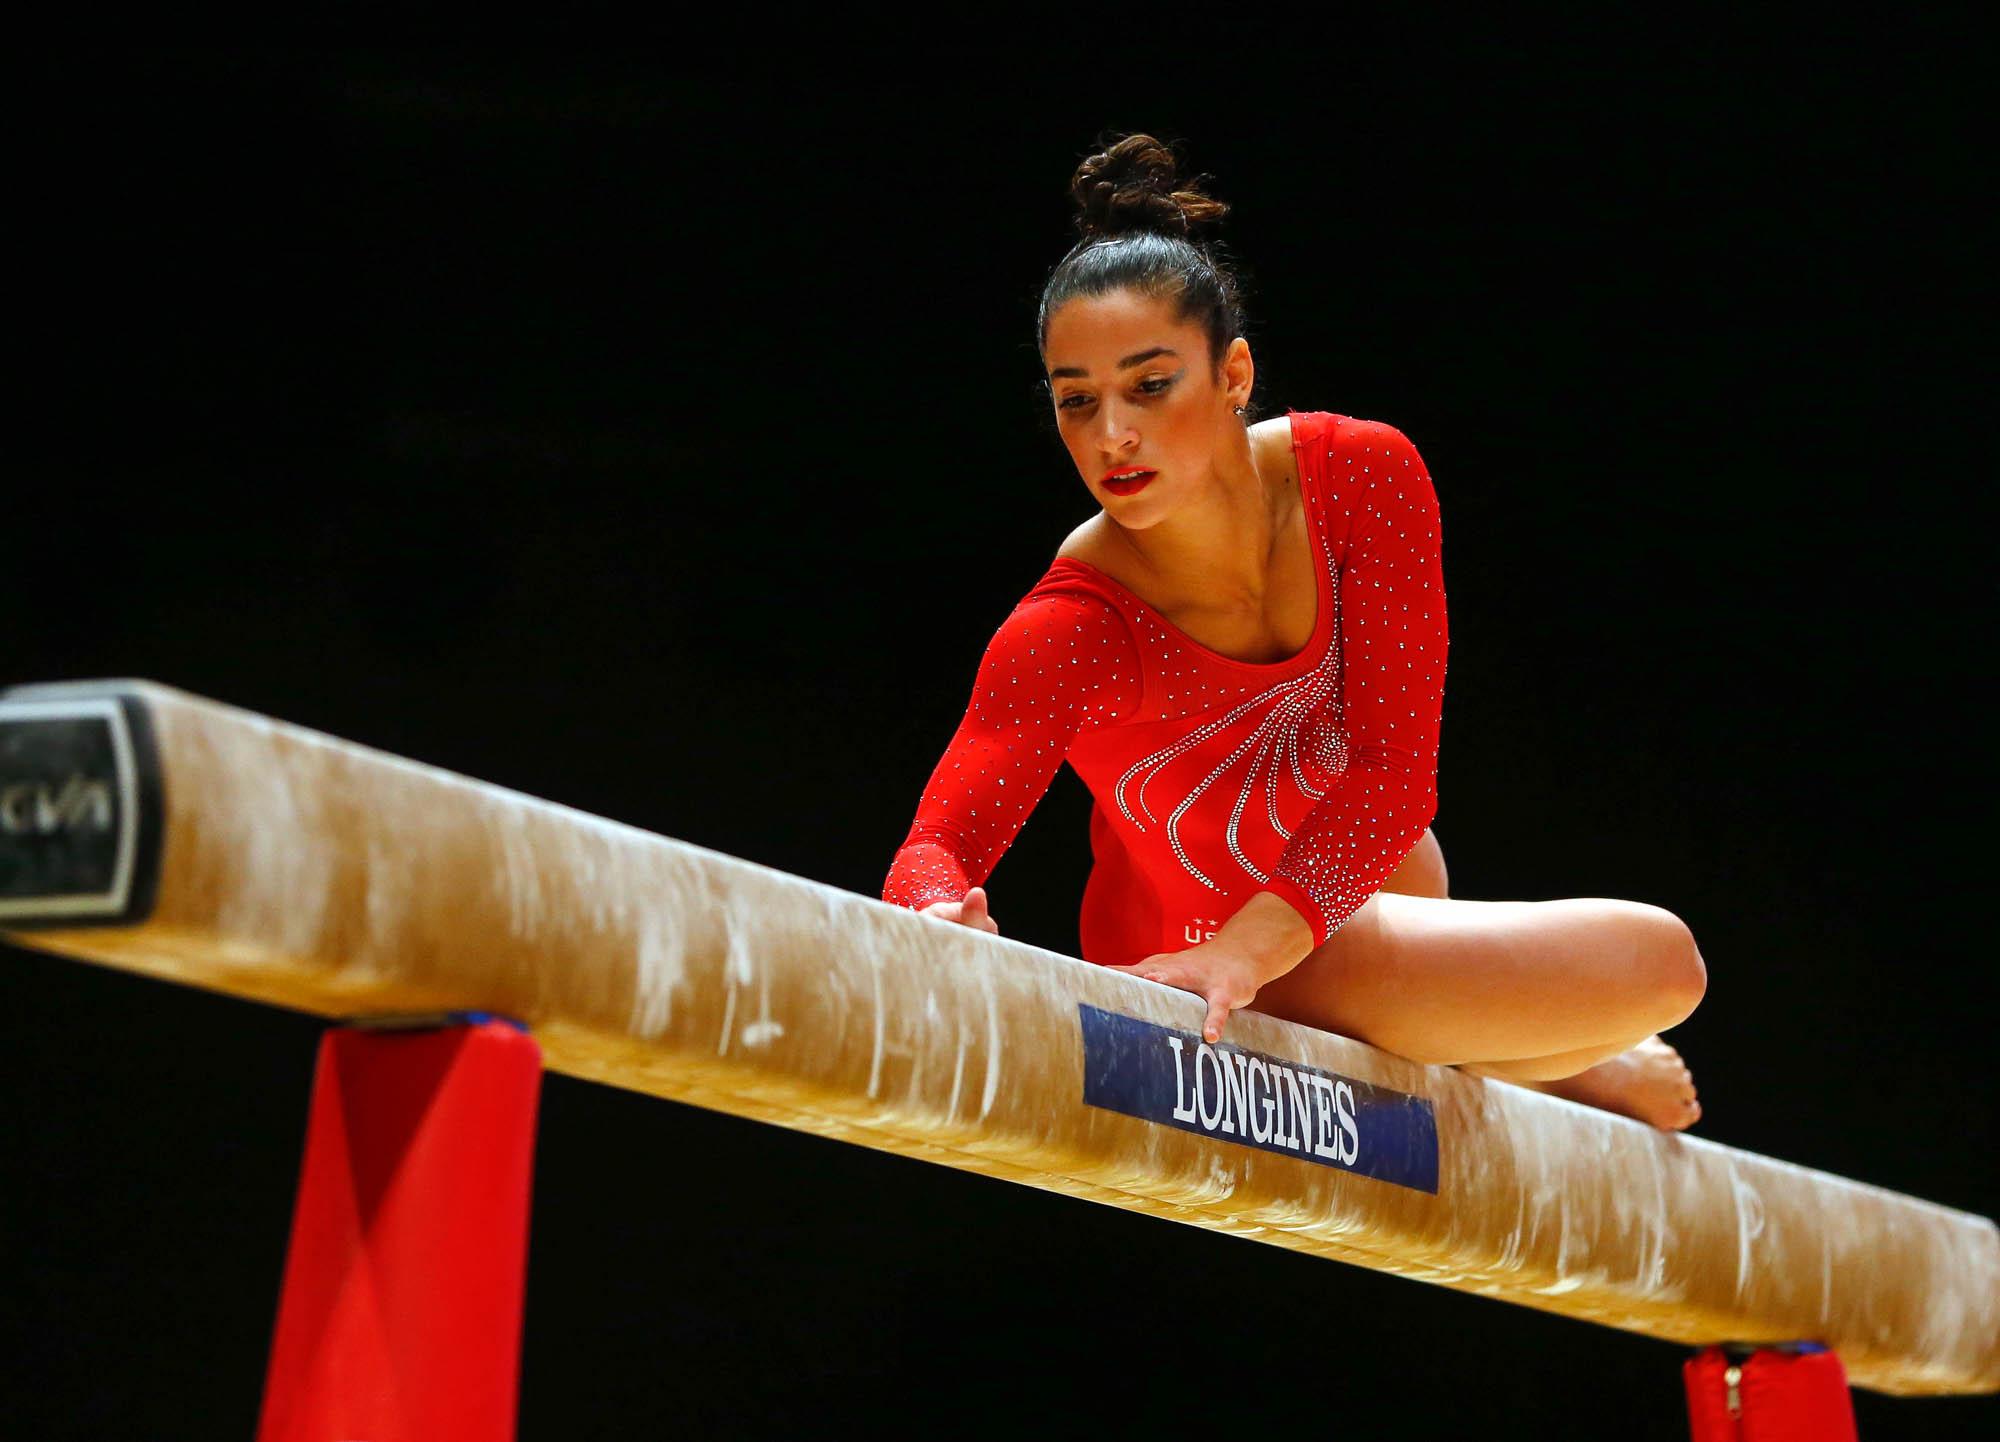 Aly Raisman on the balance beam (© AP Images)